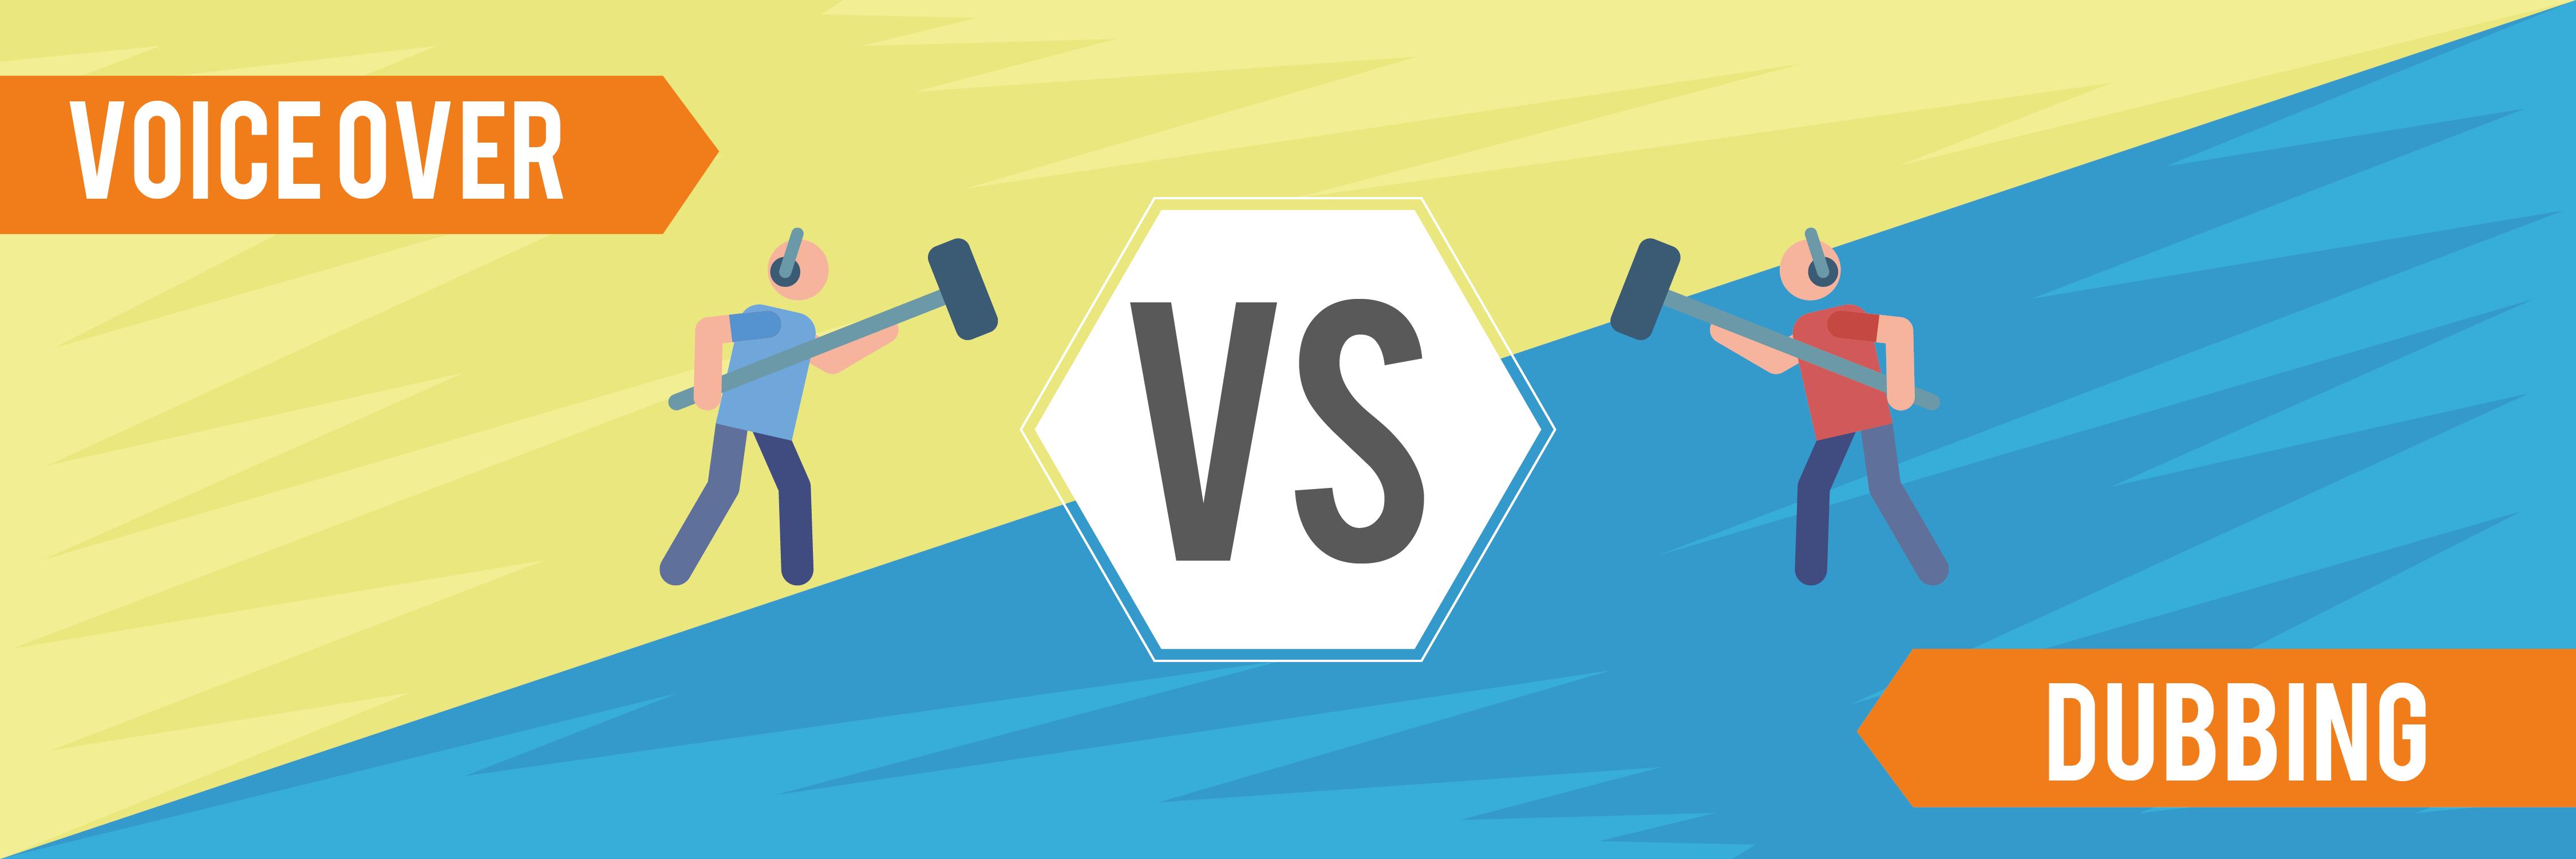 Voice-over-vs-dubbing-versus-both-of-them